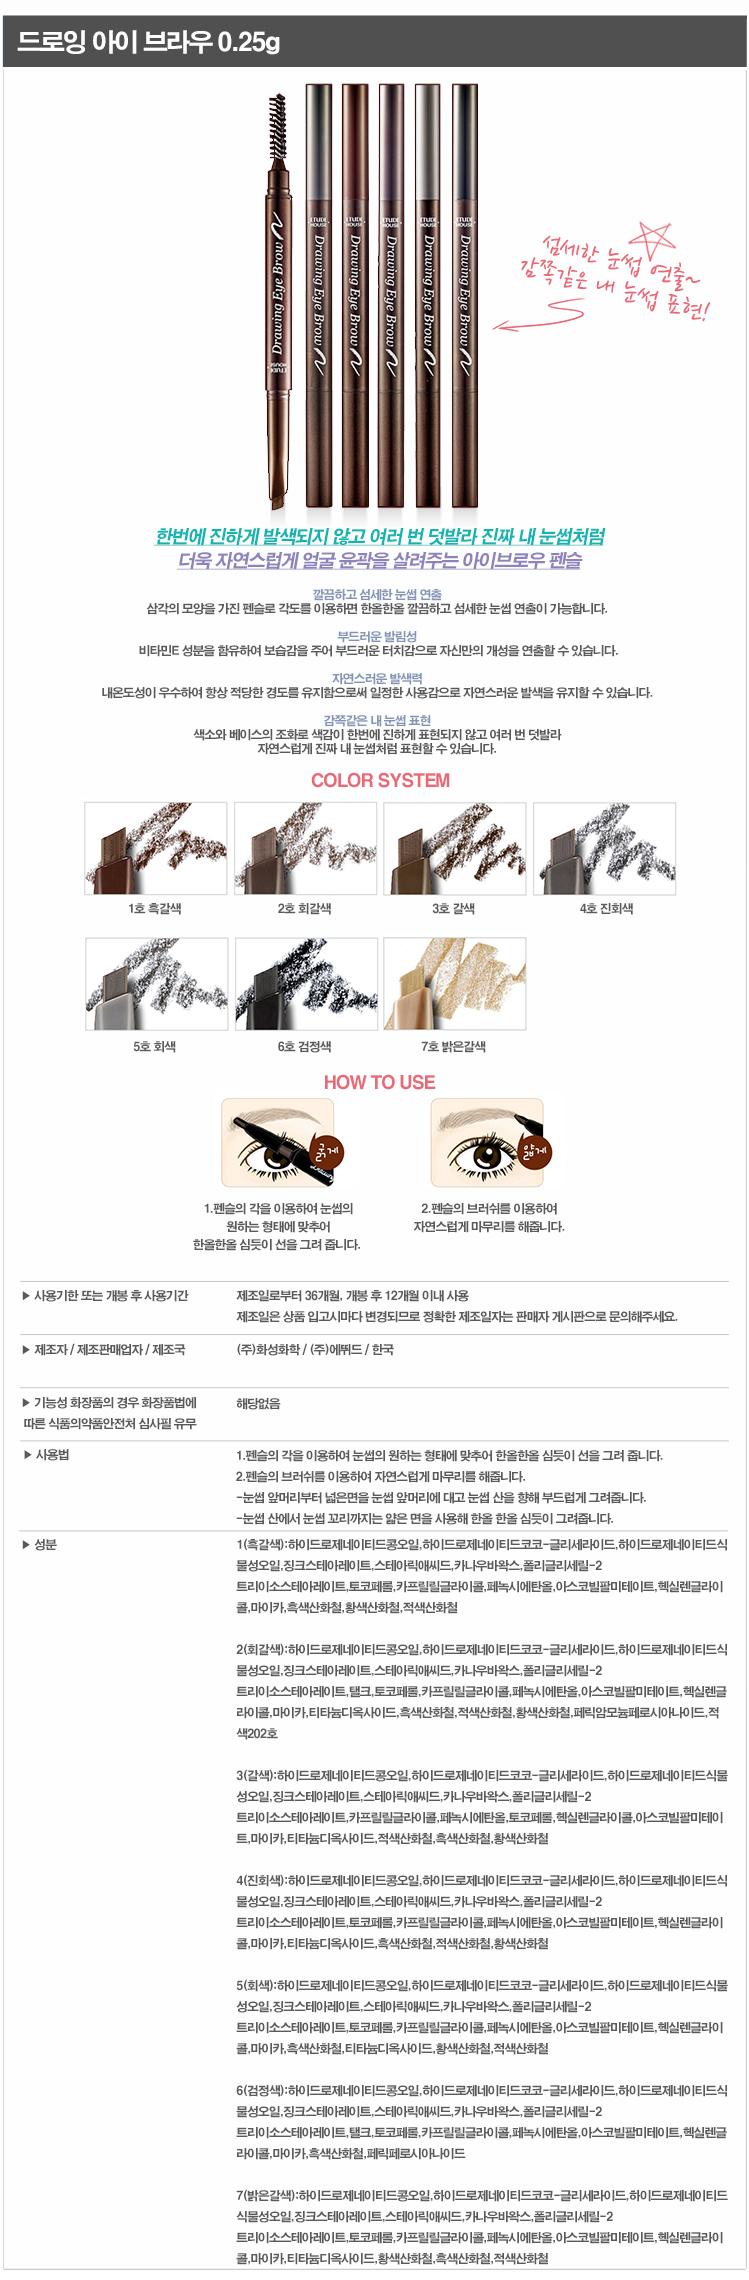 drawing_eye_brow_1g.jpg